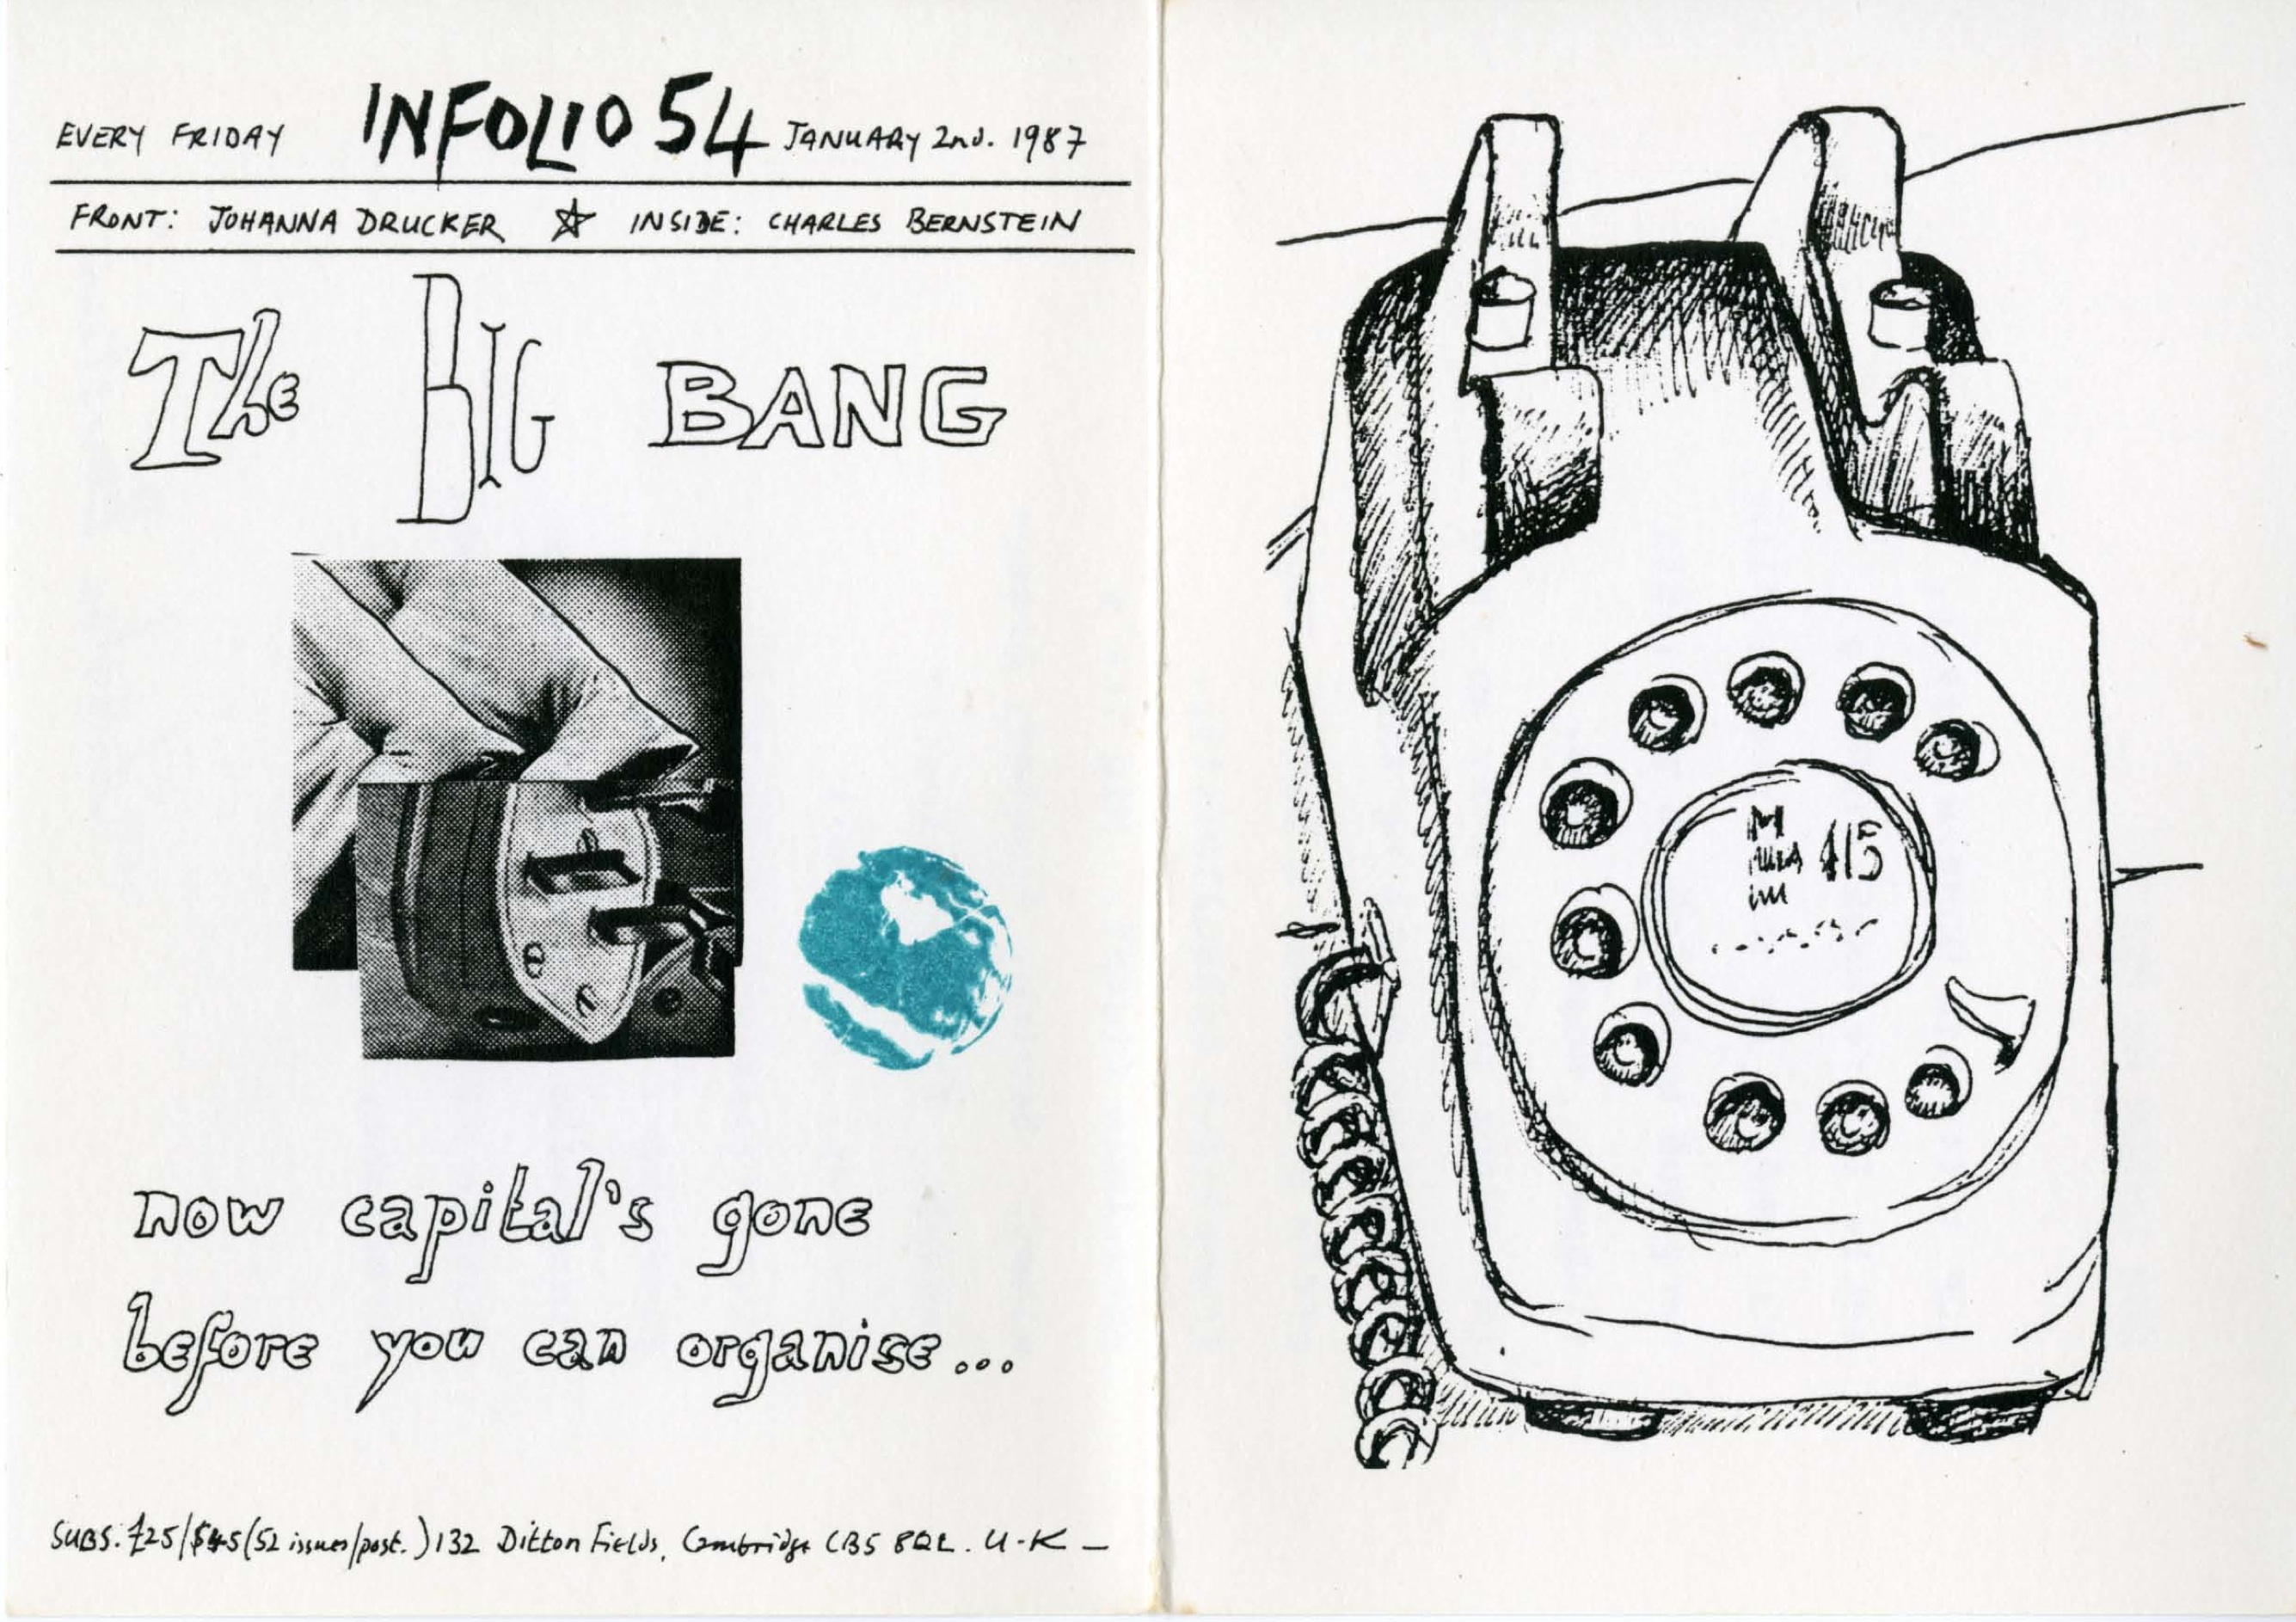 Infolio 54, January 2, 1987